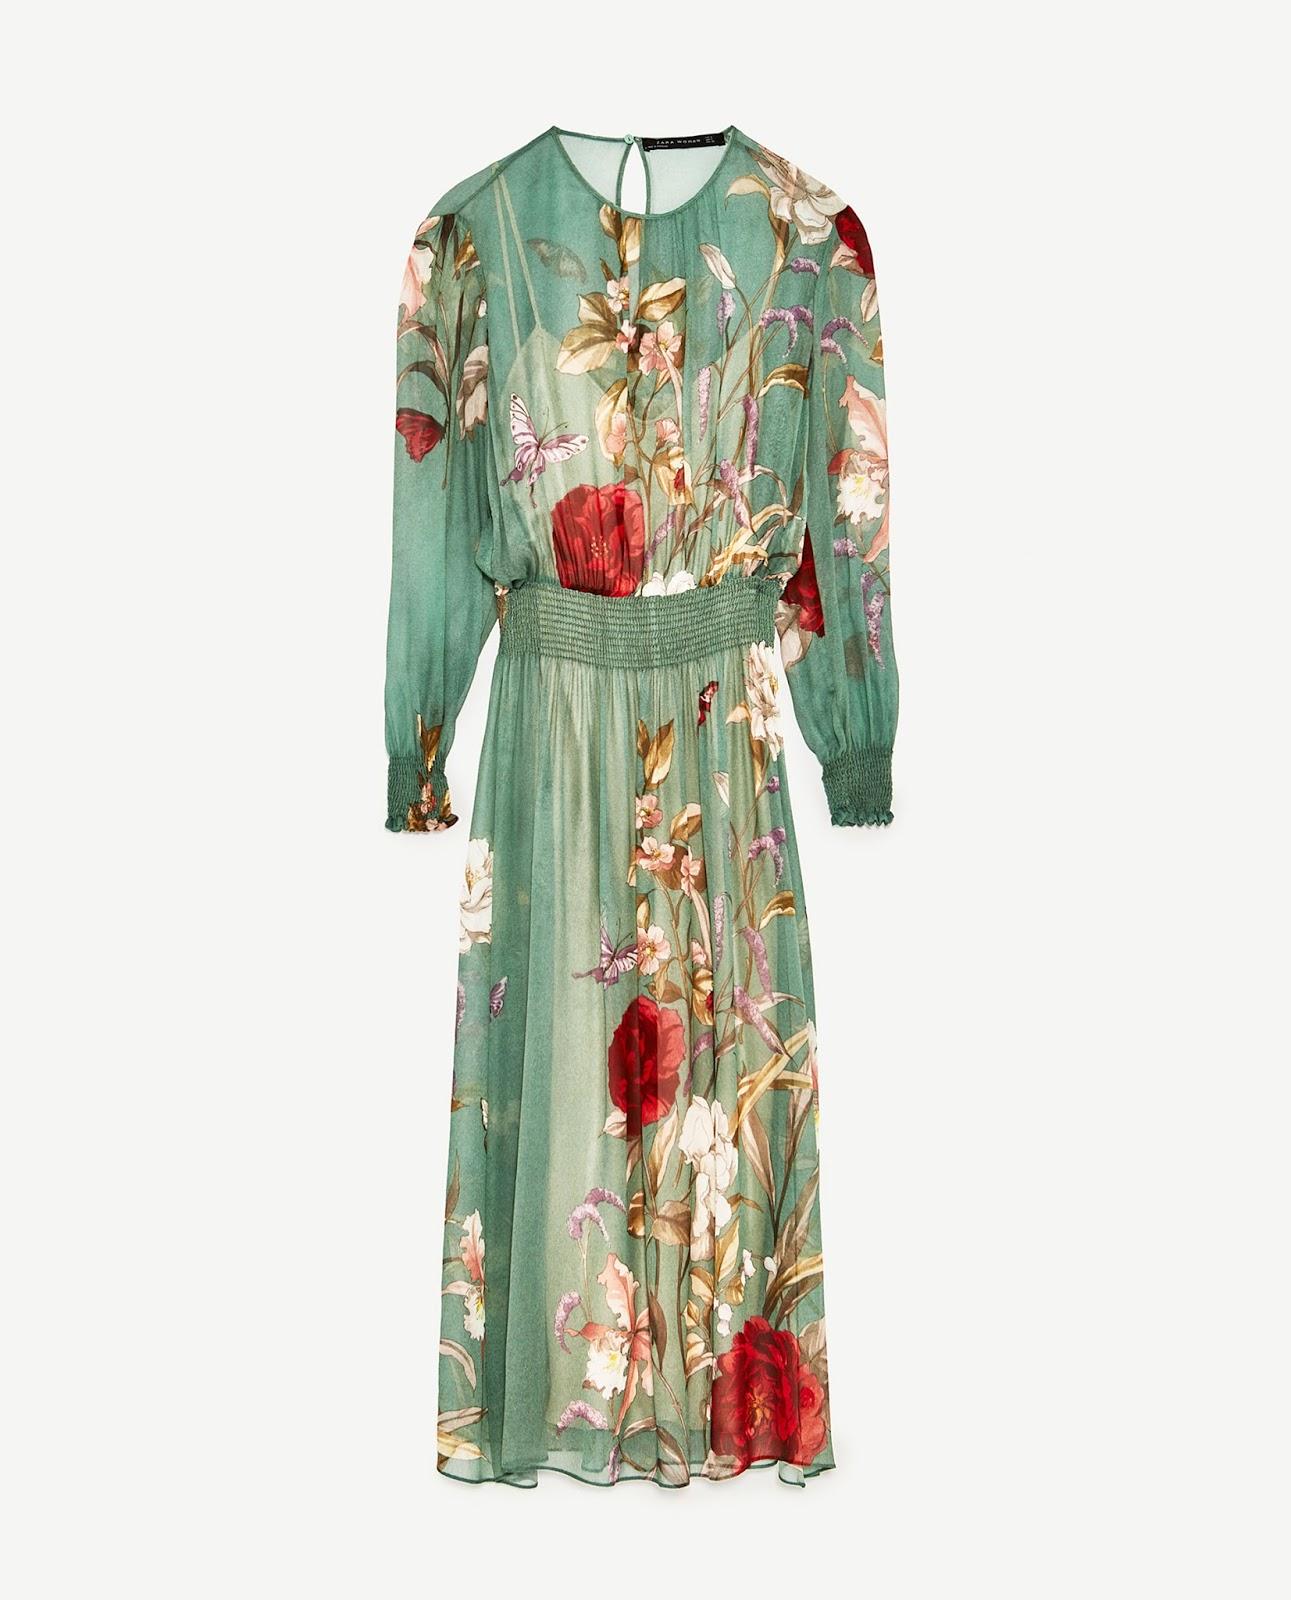 902f50efb0 É ZARA! Vestido Floral Verde da Marina Ruy Barbosa - ZAREAR